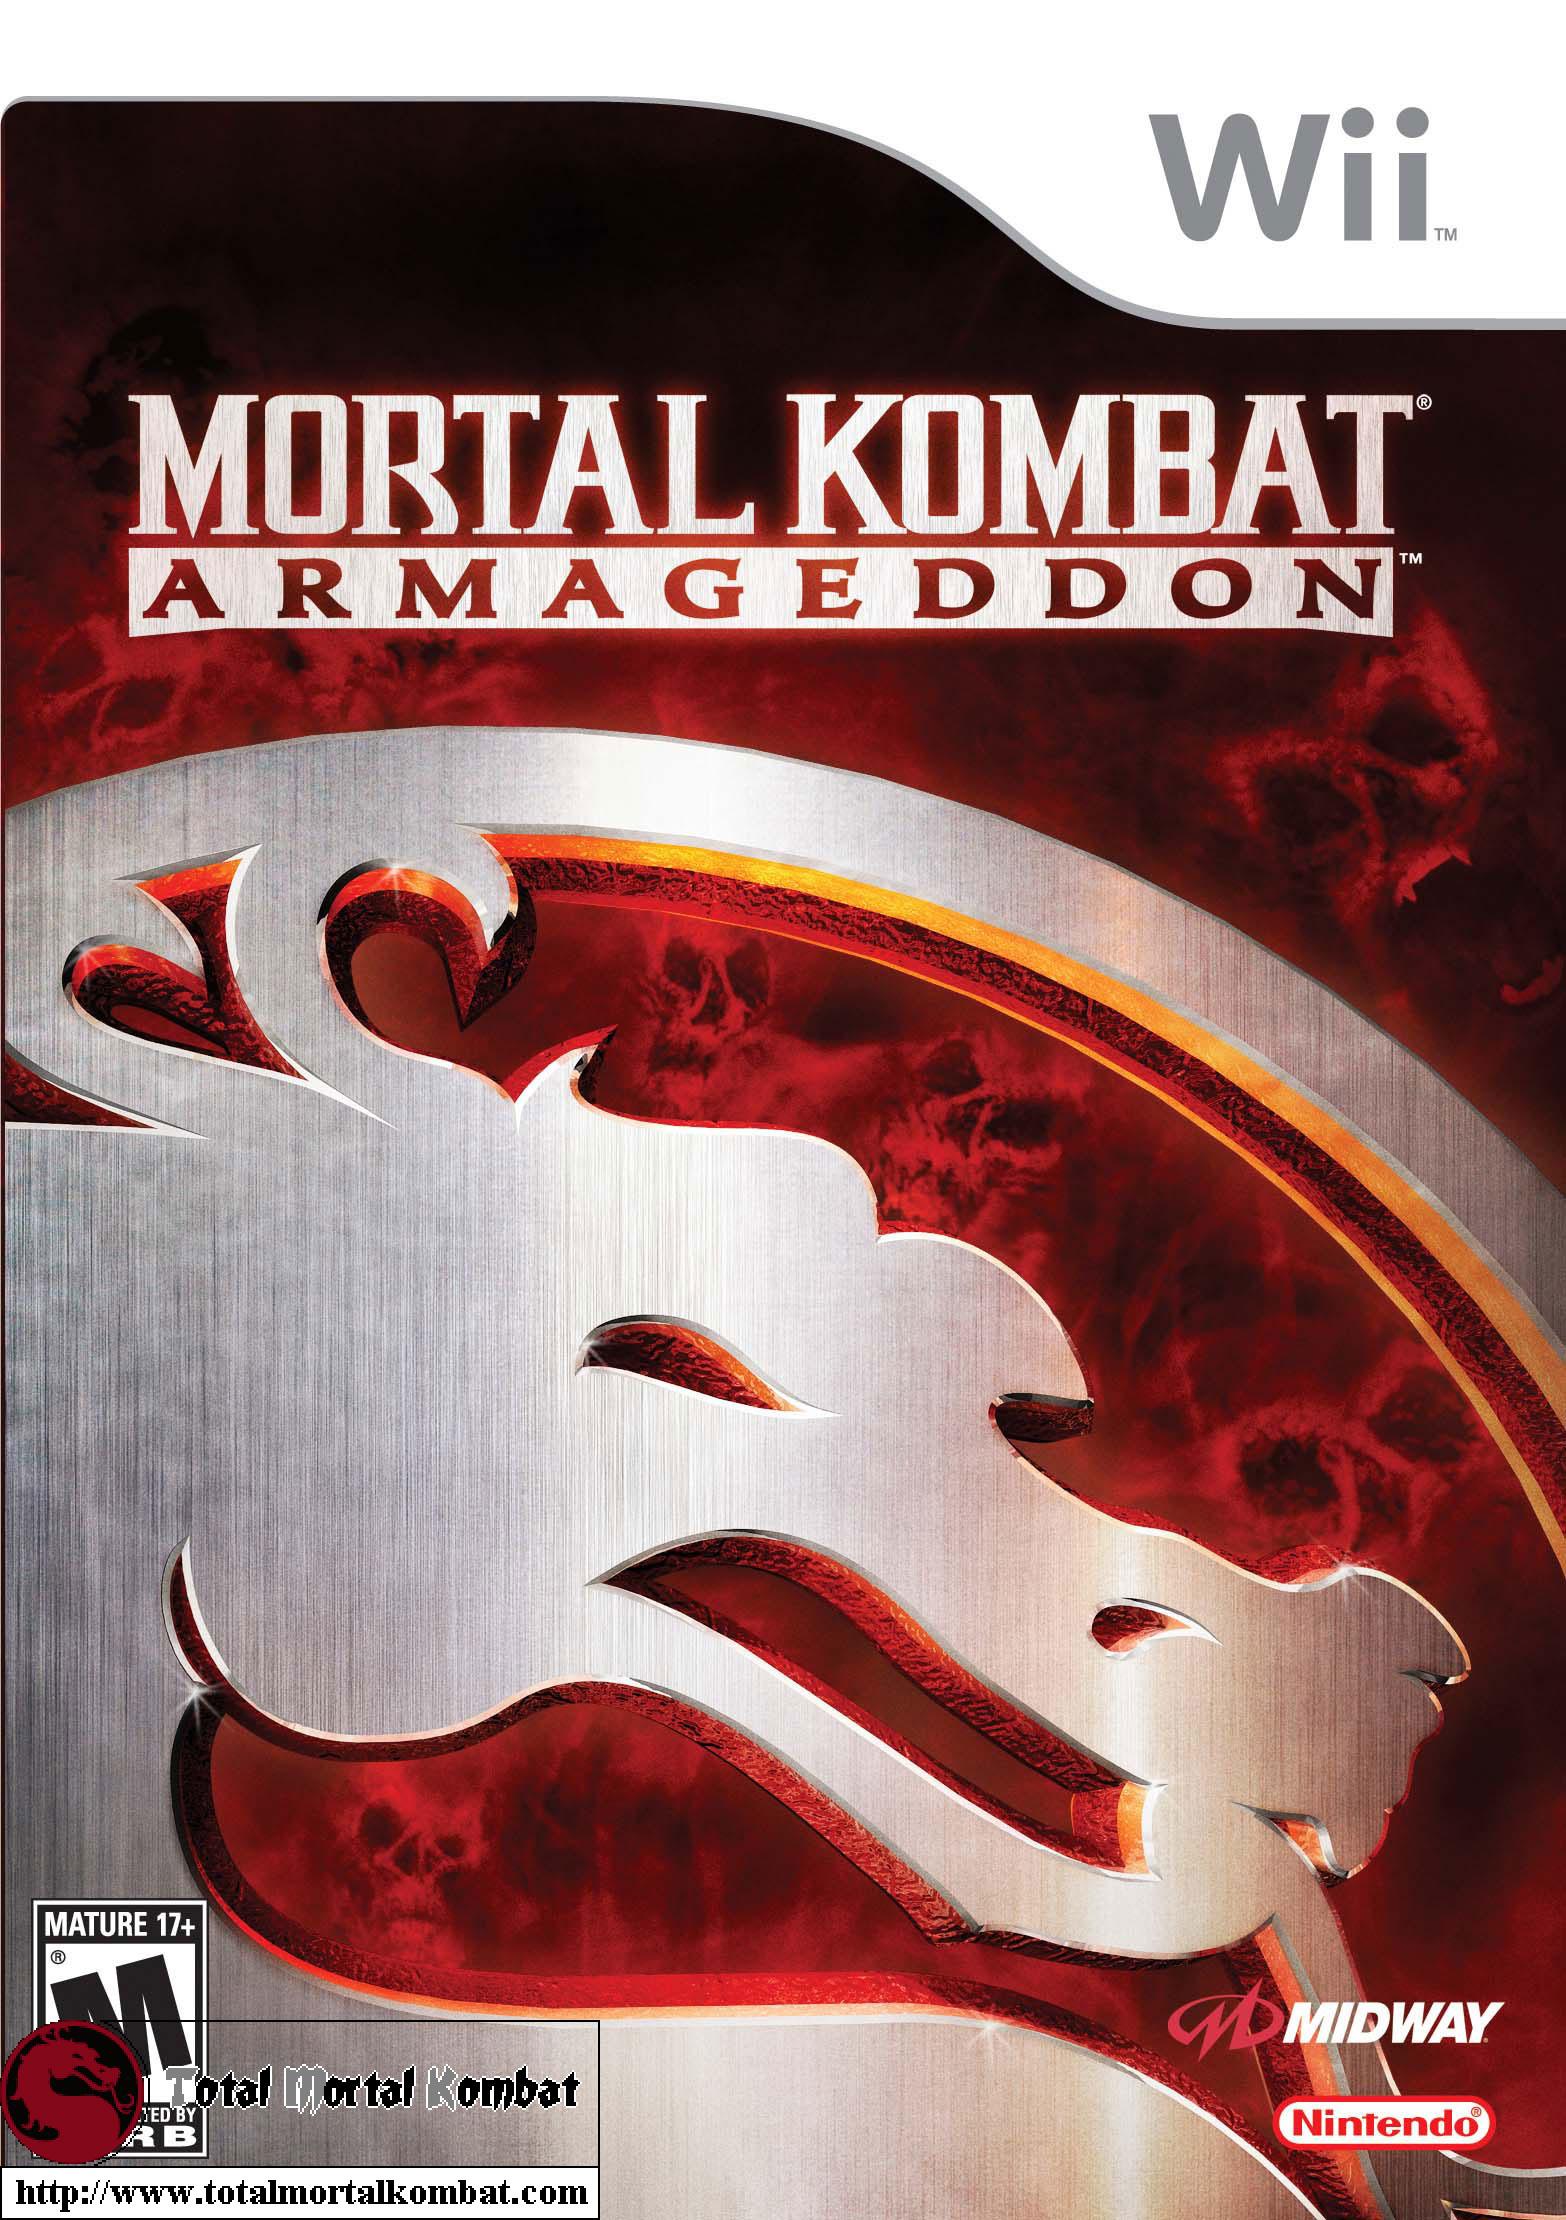 Mortal Kombat: Armageddon - Logo / Box Cover Art